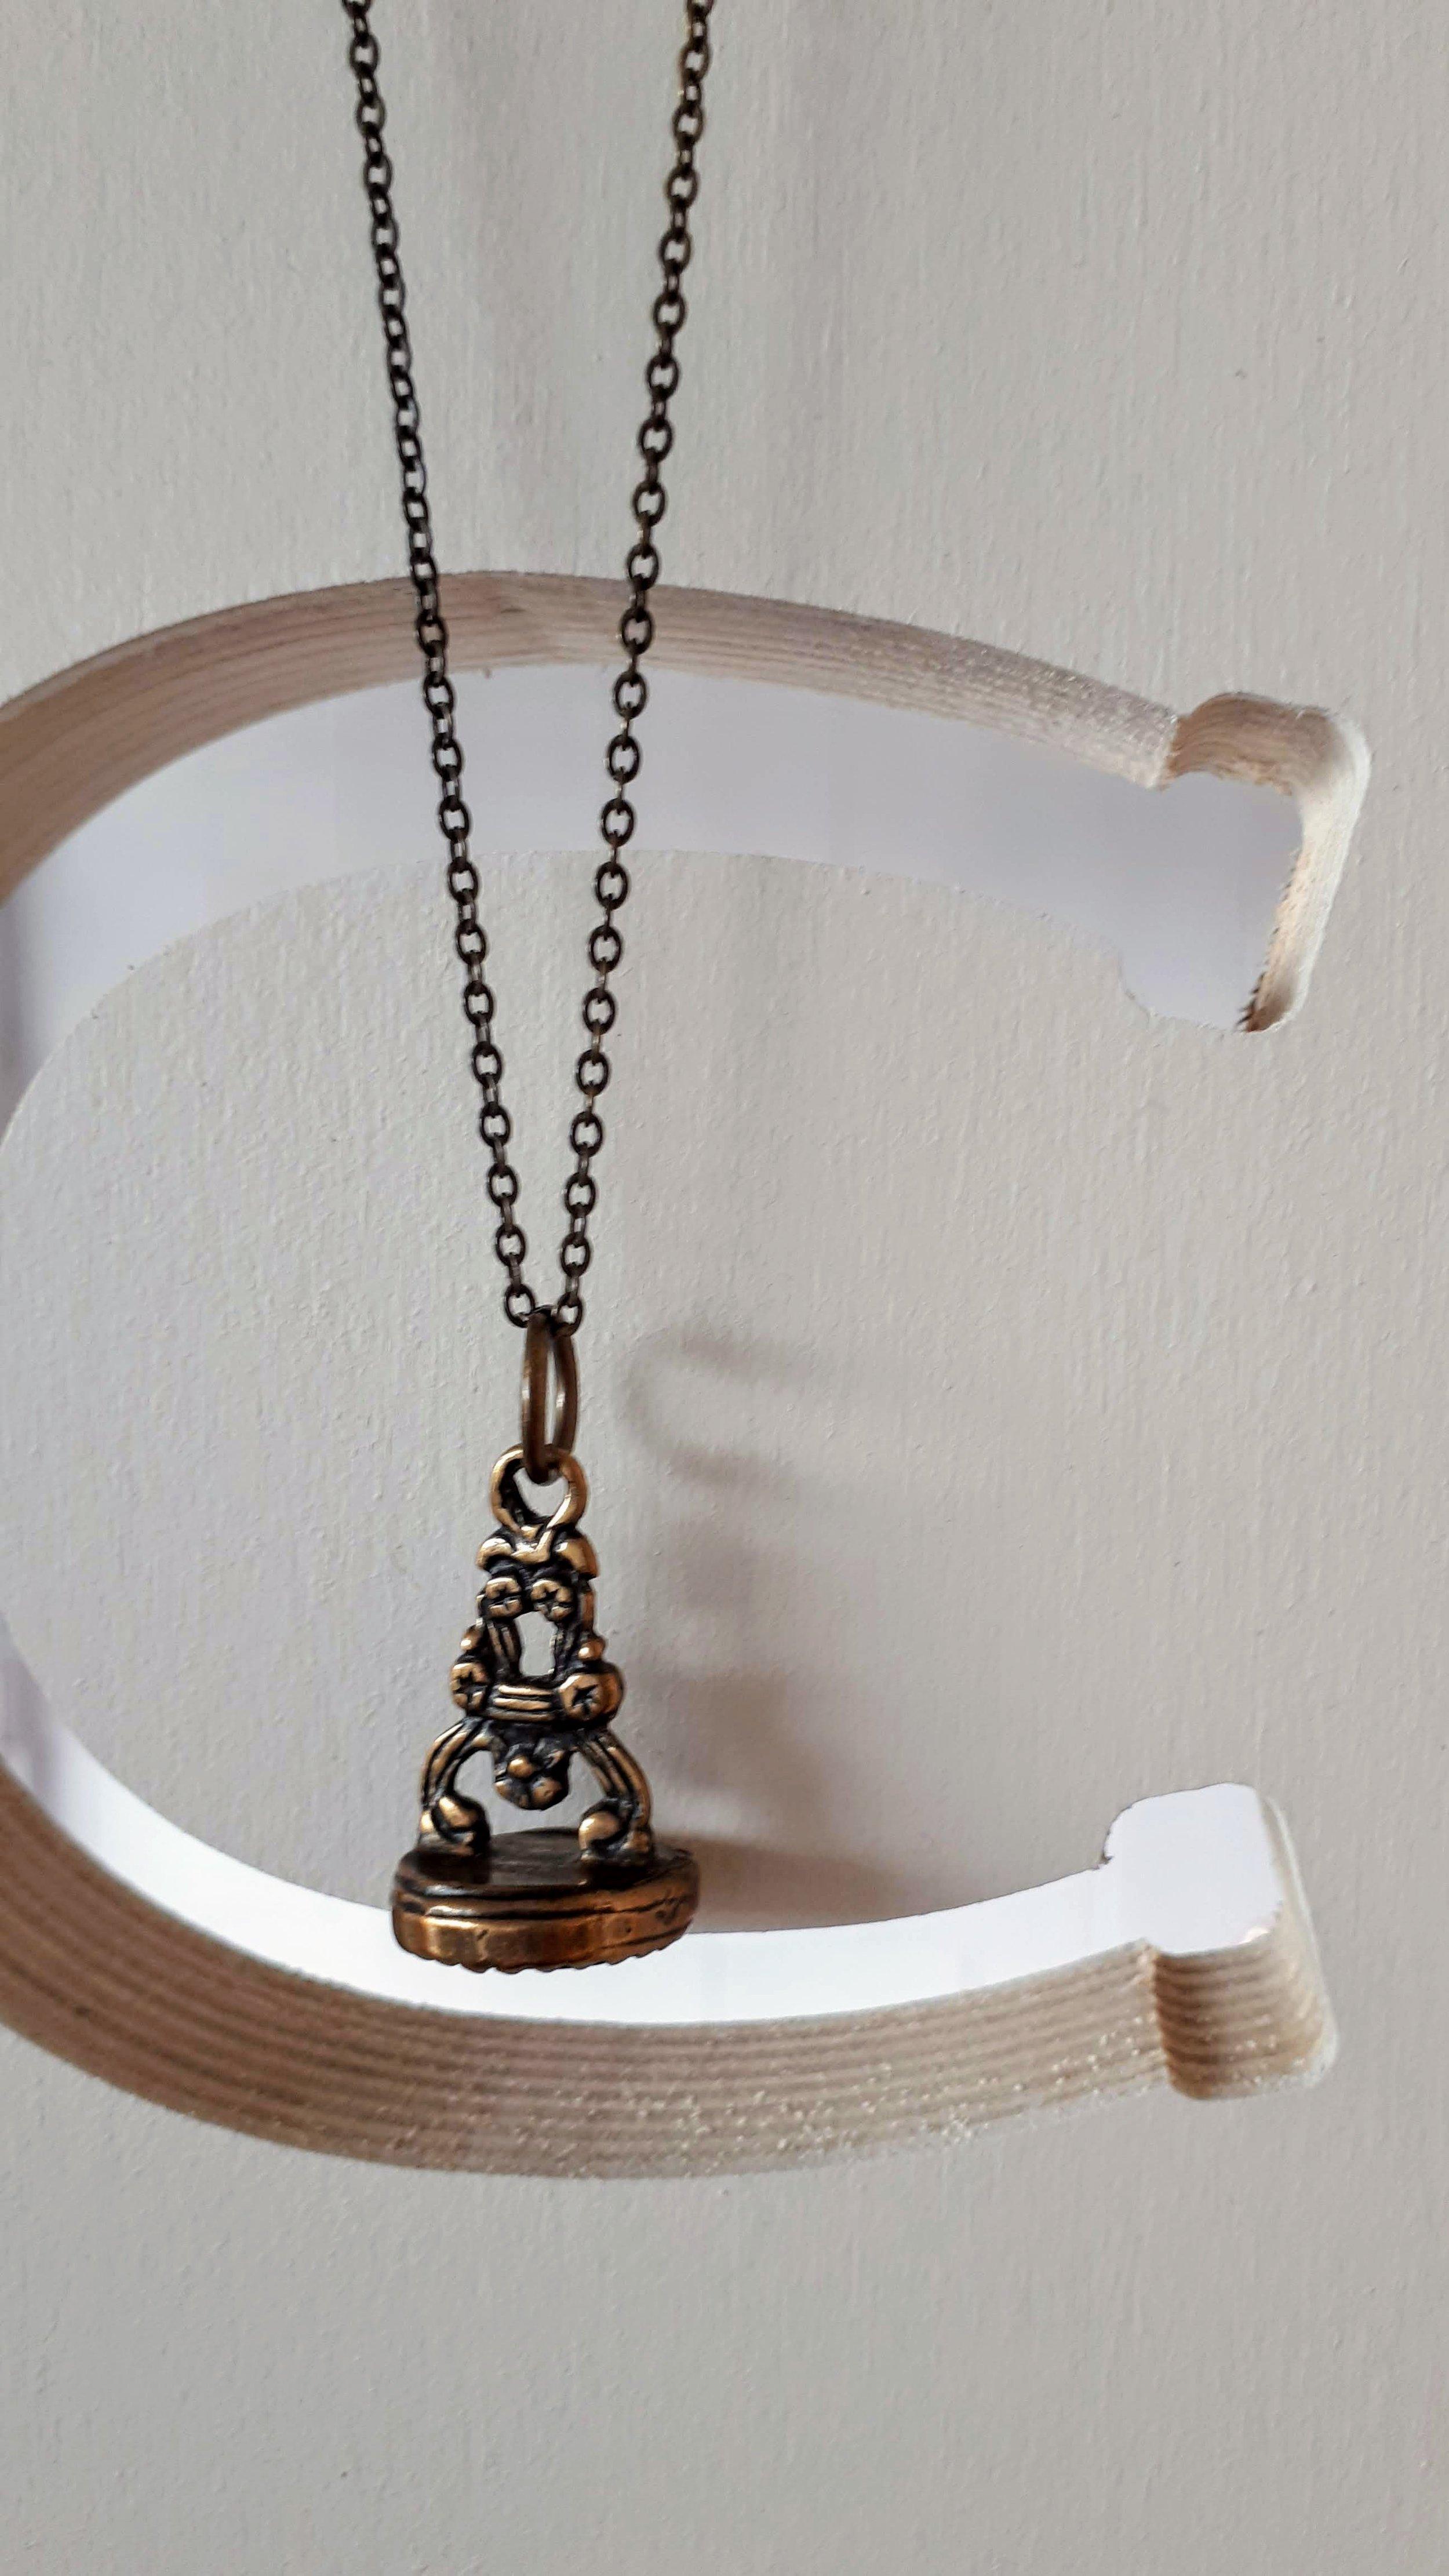 Gwen Deliscious necklace, $26